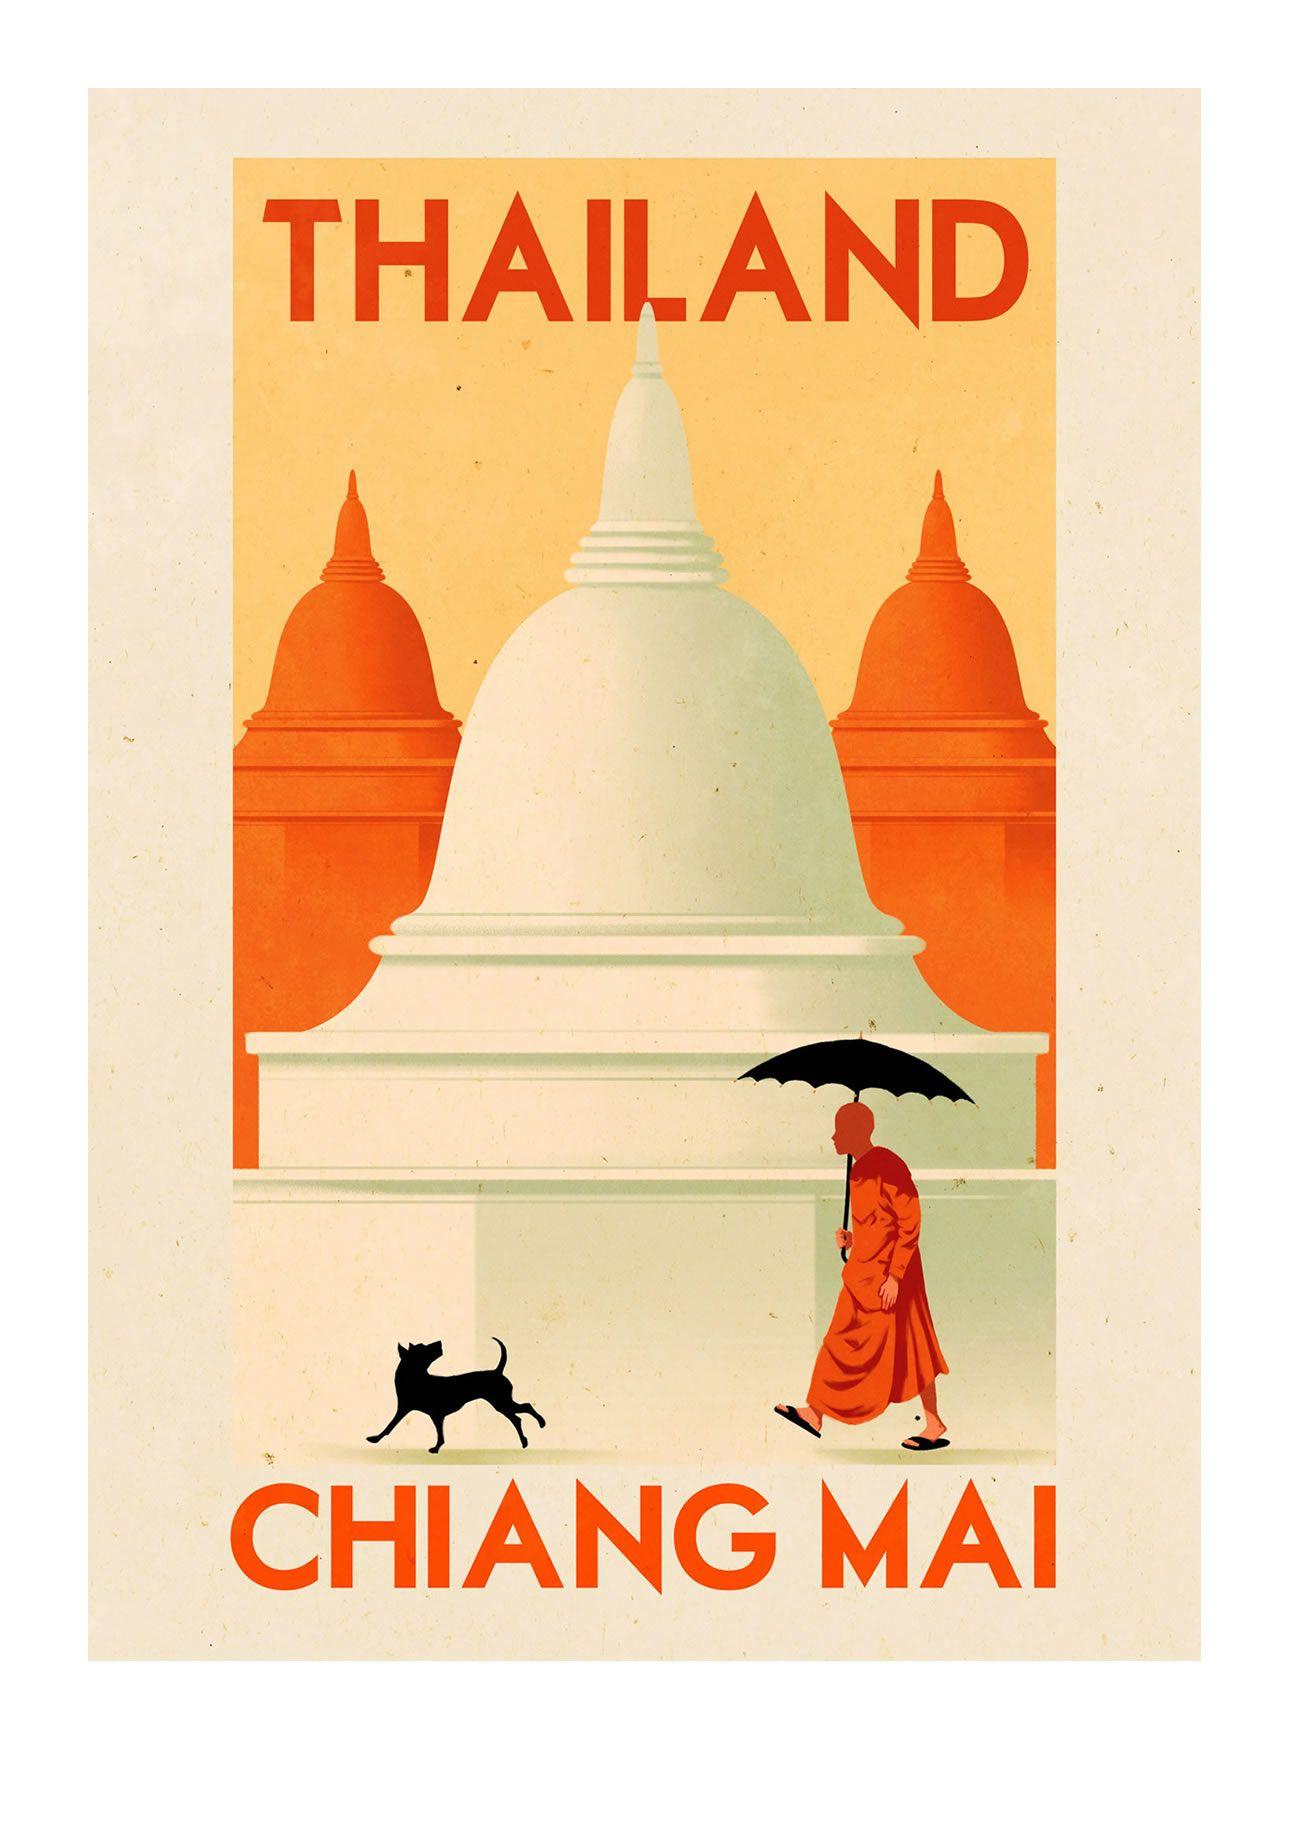 Ruiricardo Folio Illustration Boutique Fine Art Prints Travel Poster Vintage Landmarks Thai Xl Jpg 1289 1 Vintage Travel Posters Travel Posters Vintage Travel